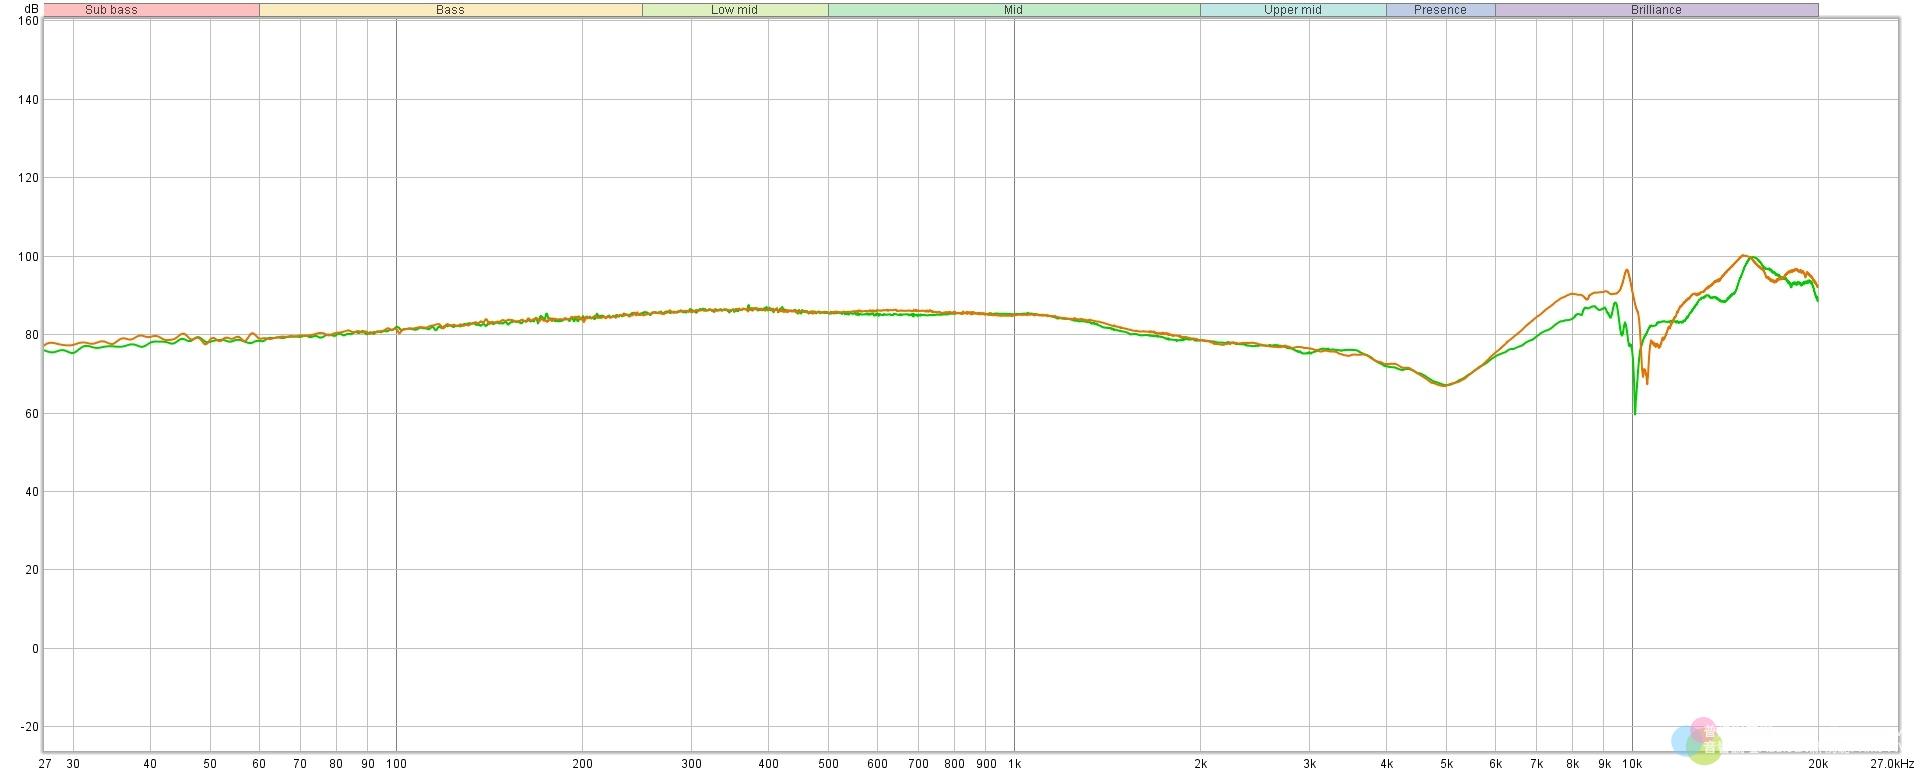 T+A Solitaire P平面振膜耳機+HA 200耳擴/DAC:目前所聞最迷人的耳機系統! 170702x0v4dpz2ppwpwwzq.jpg HA 200 平面振膜耳機 耳擴 DAC DSD 鈦孚